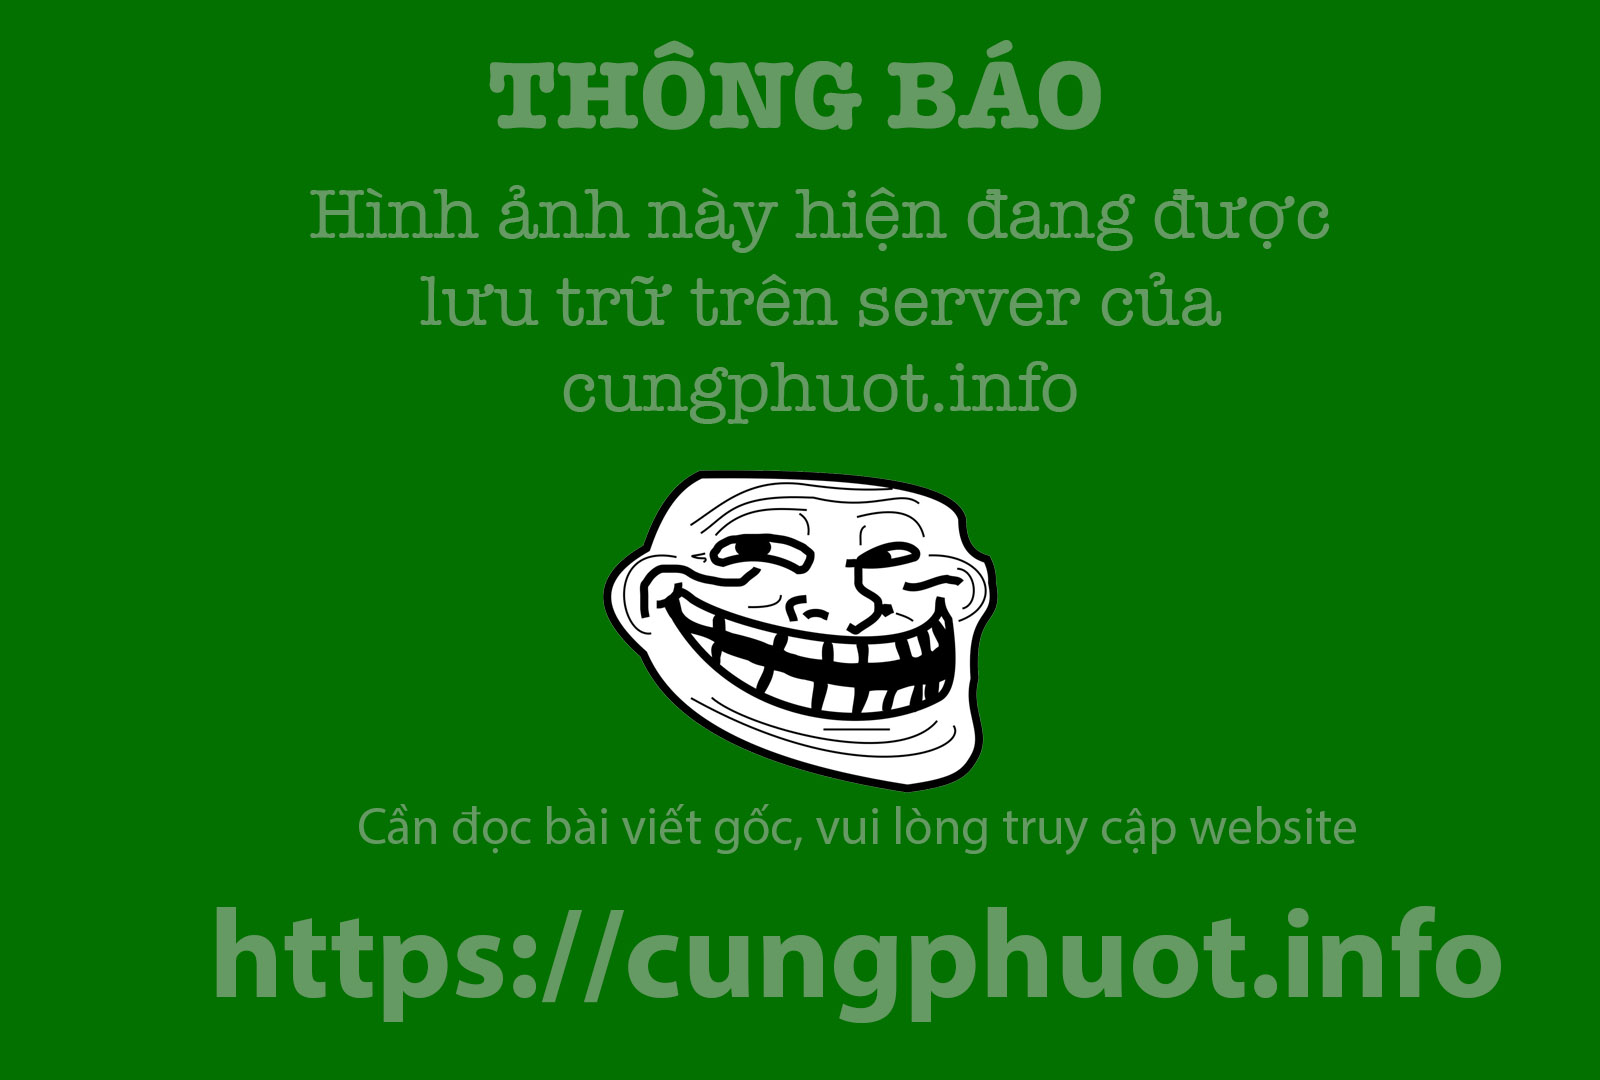 Co do Lam Kinh nhin tu tren cao hinh anh 2